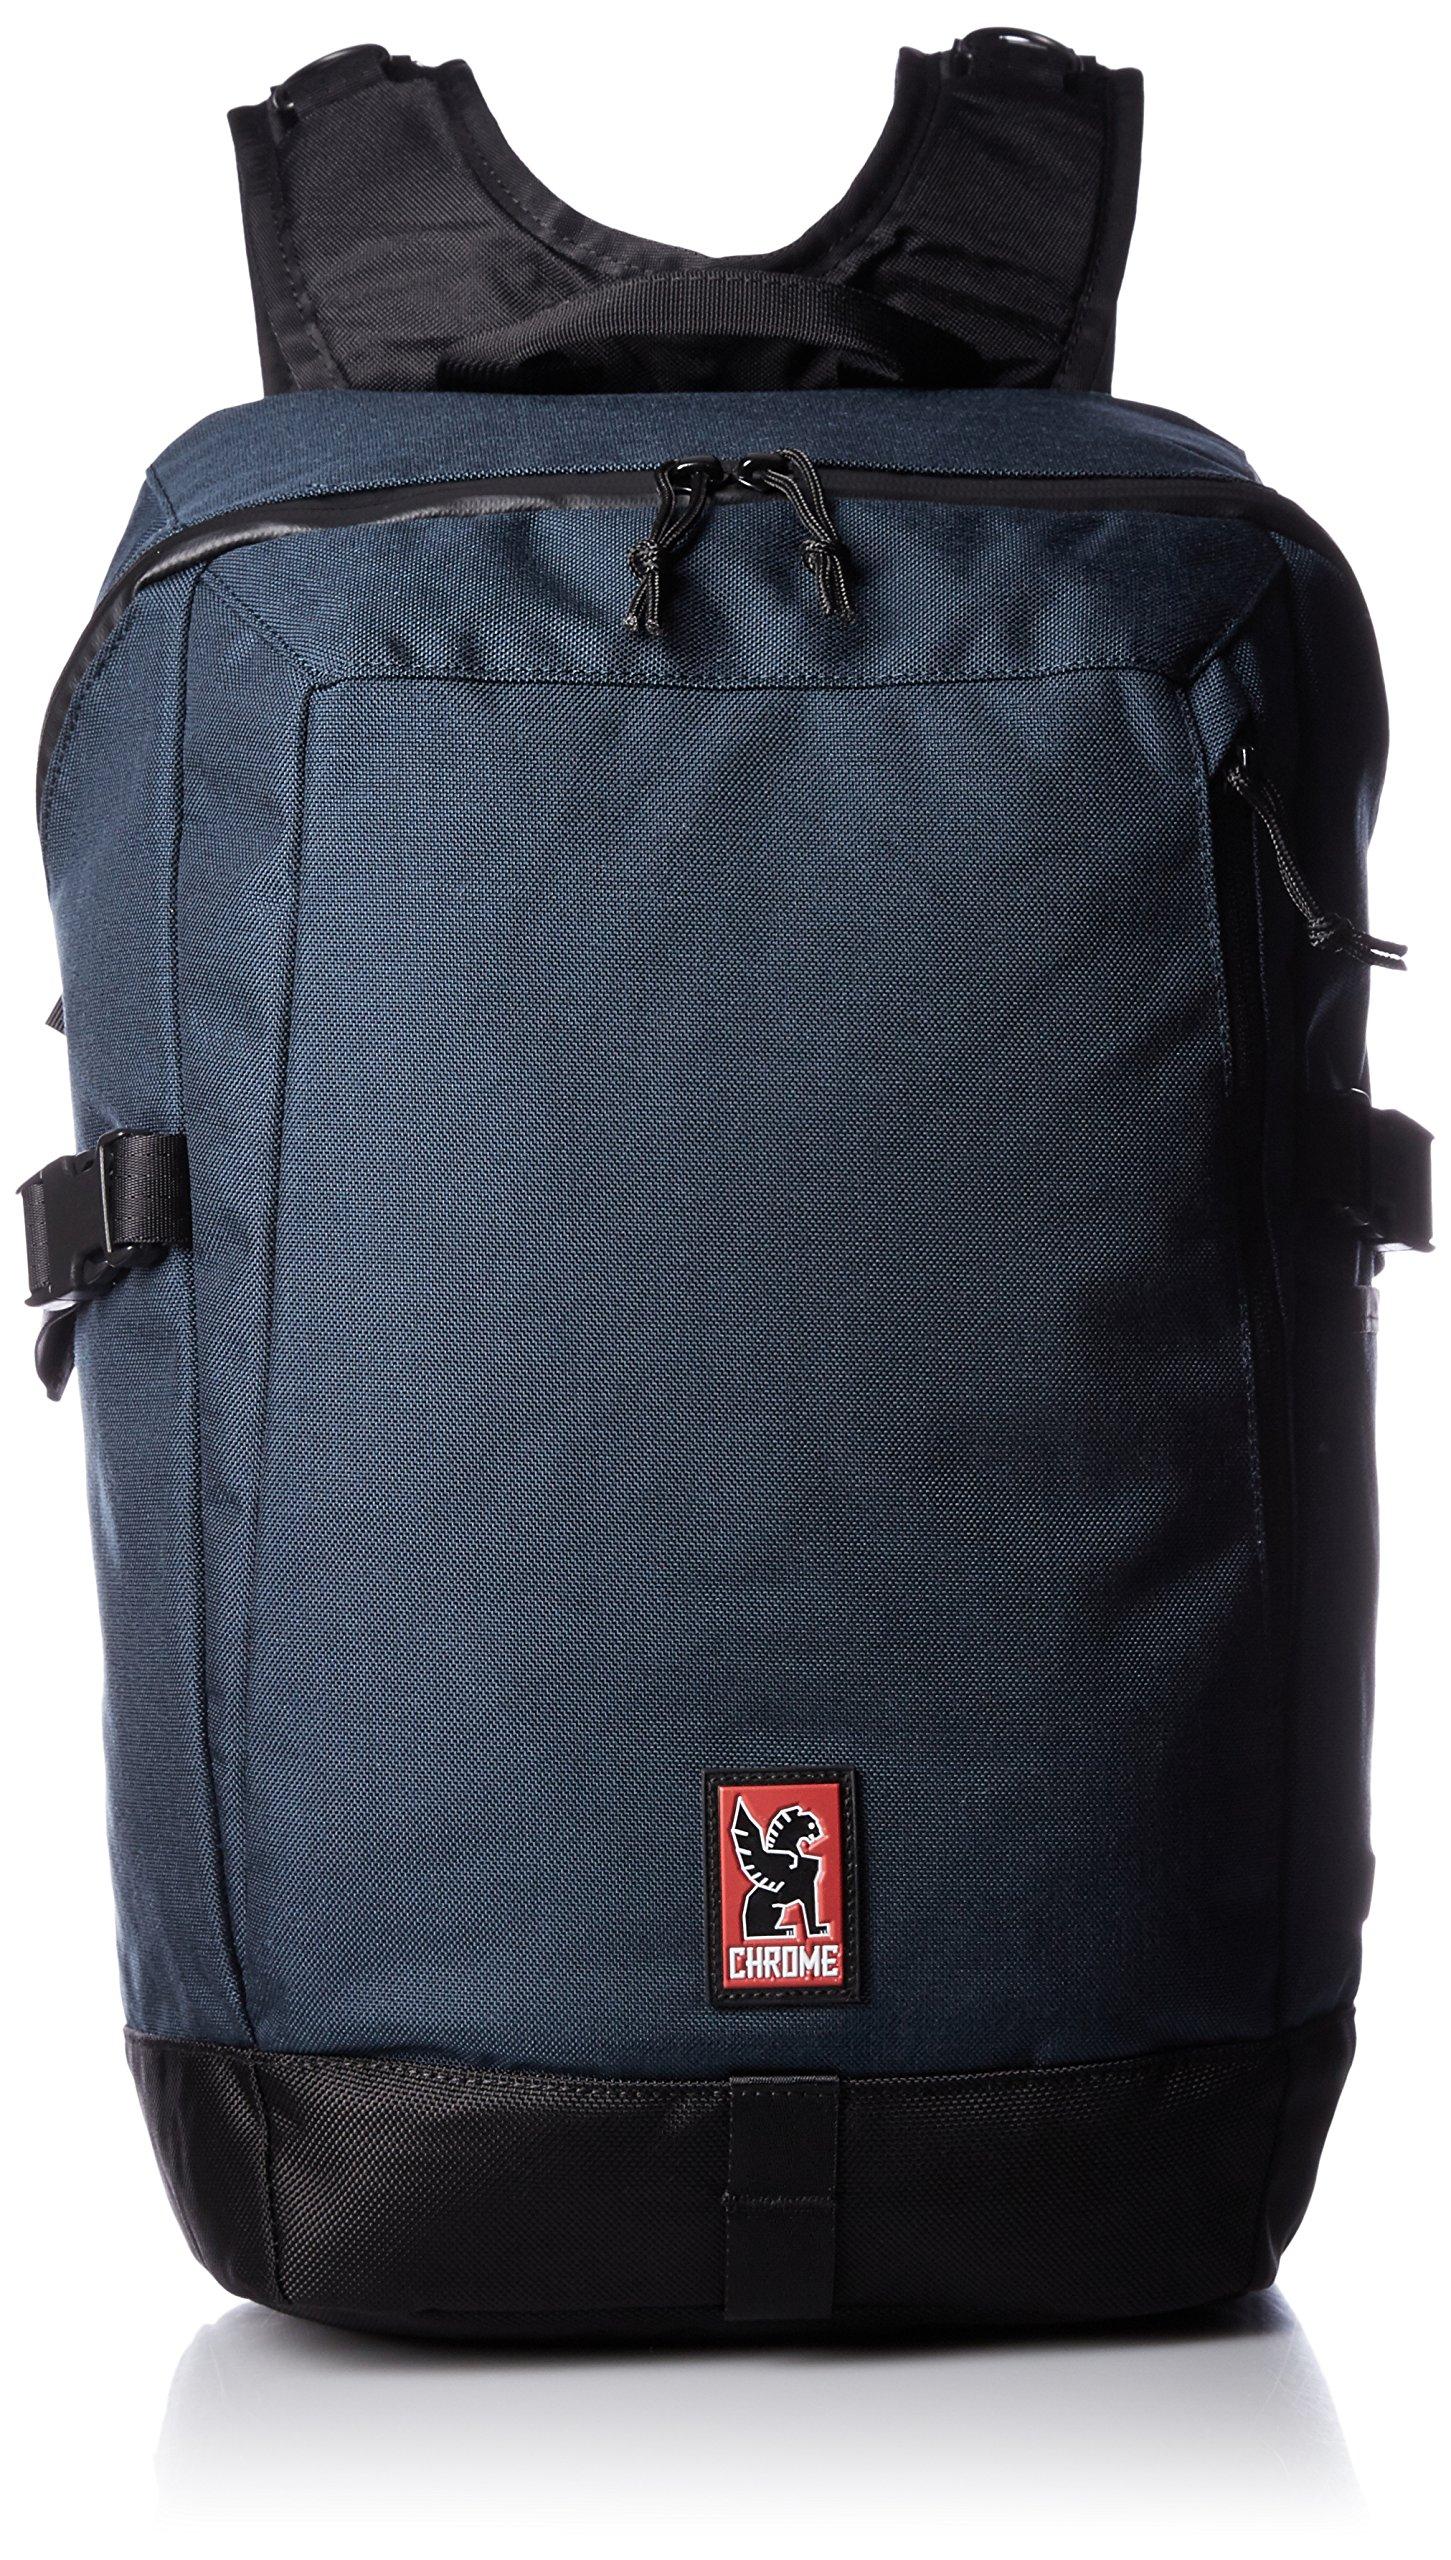 Chrome BG-187-IN Indigo/Black One Size Rostov Backpack